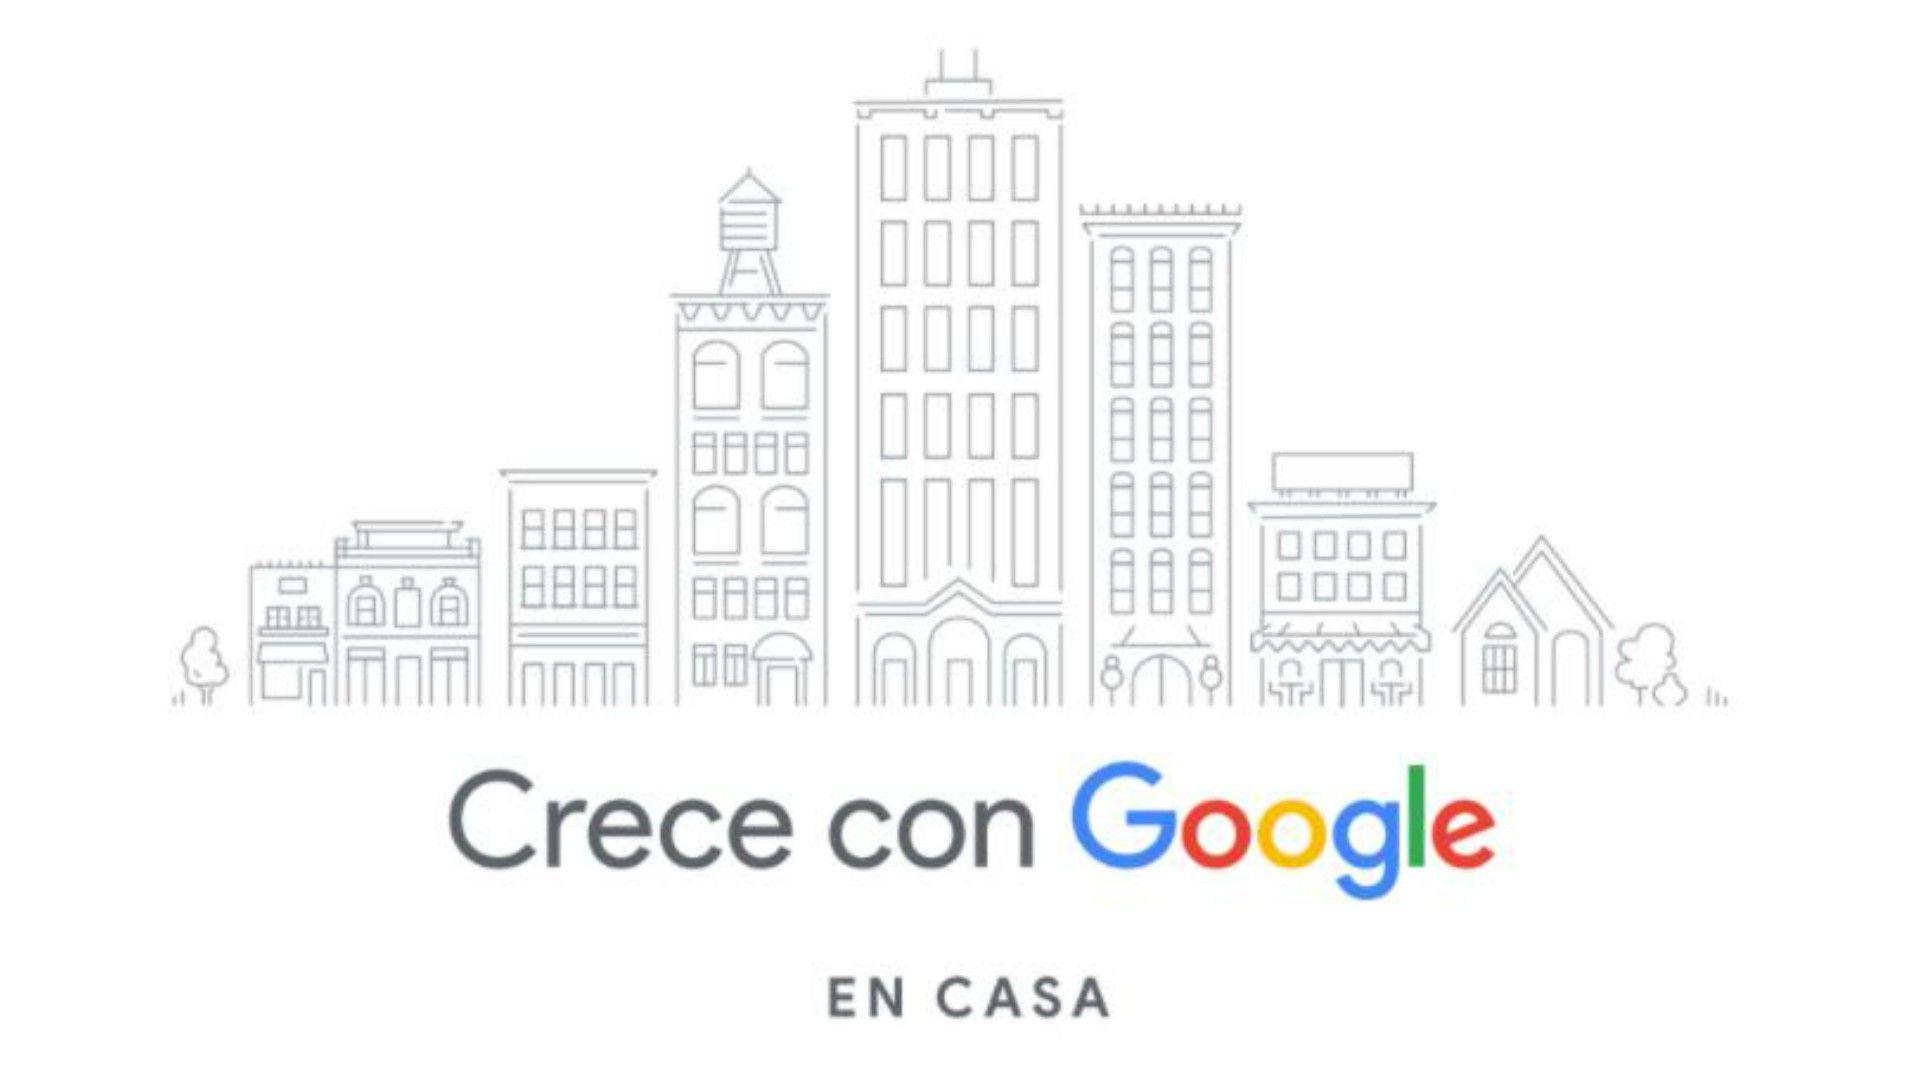 Crece con Google en Casa